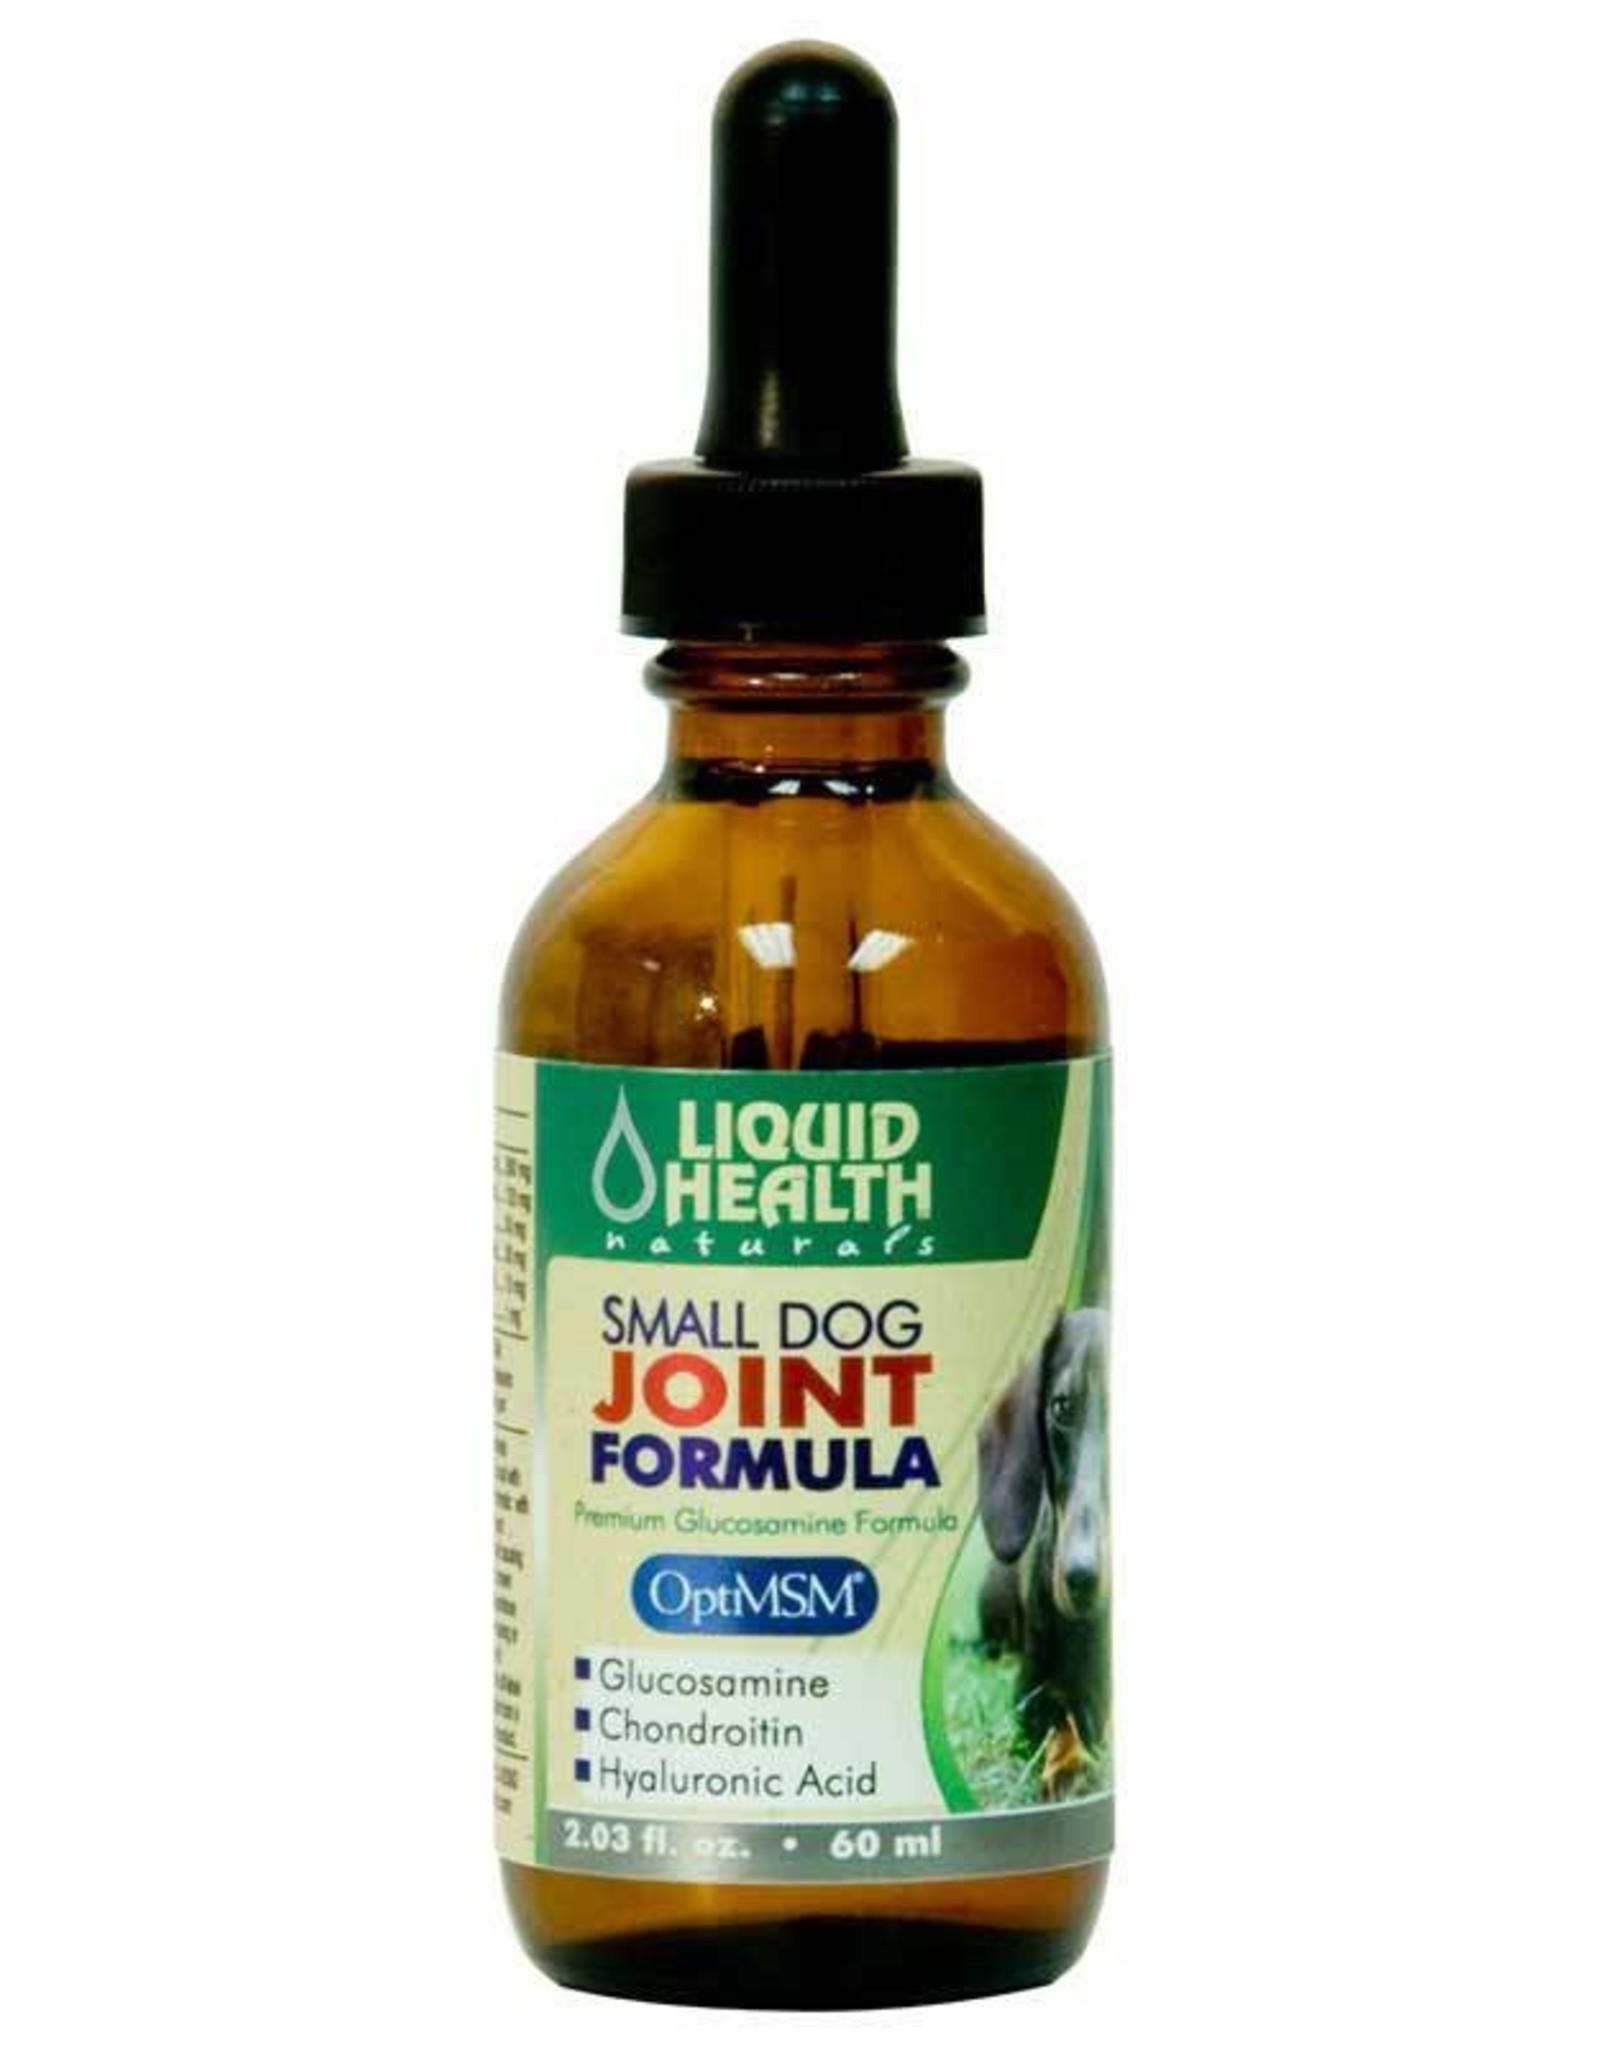 Liquid Health SALE - Liquid Health Small Dog Joint Formula 2oz